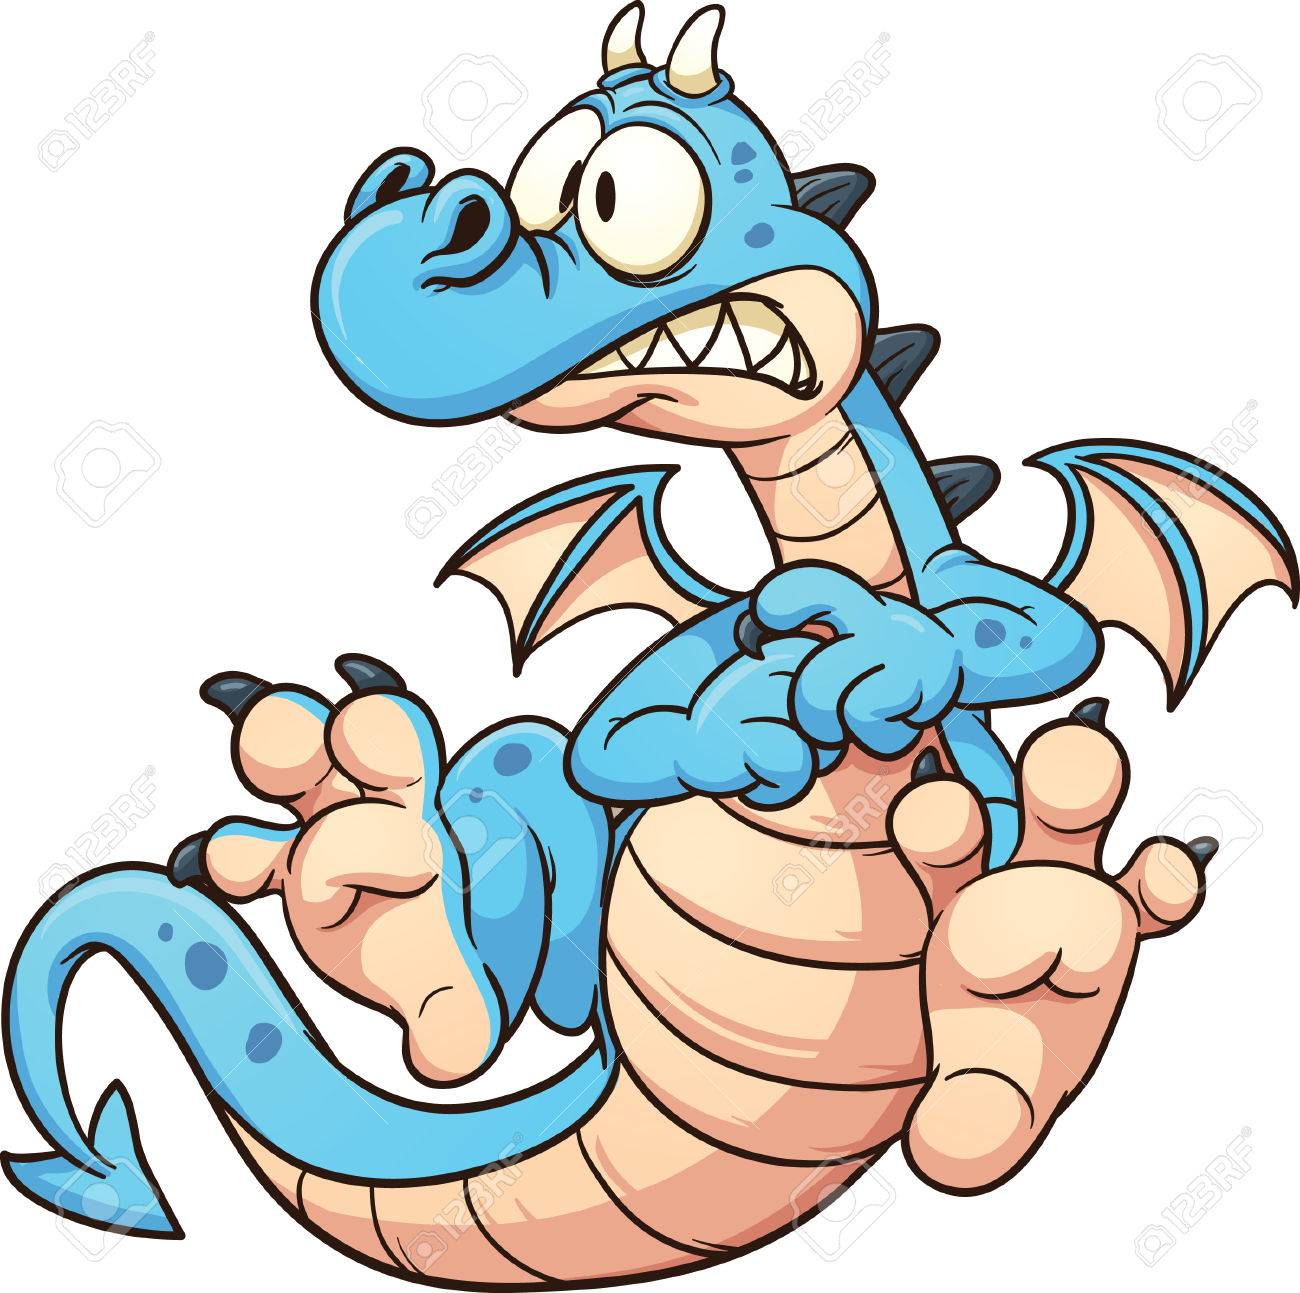 1300x1293 Blue Dragon Clipart Simple